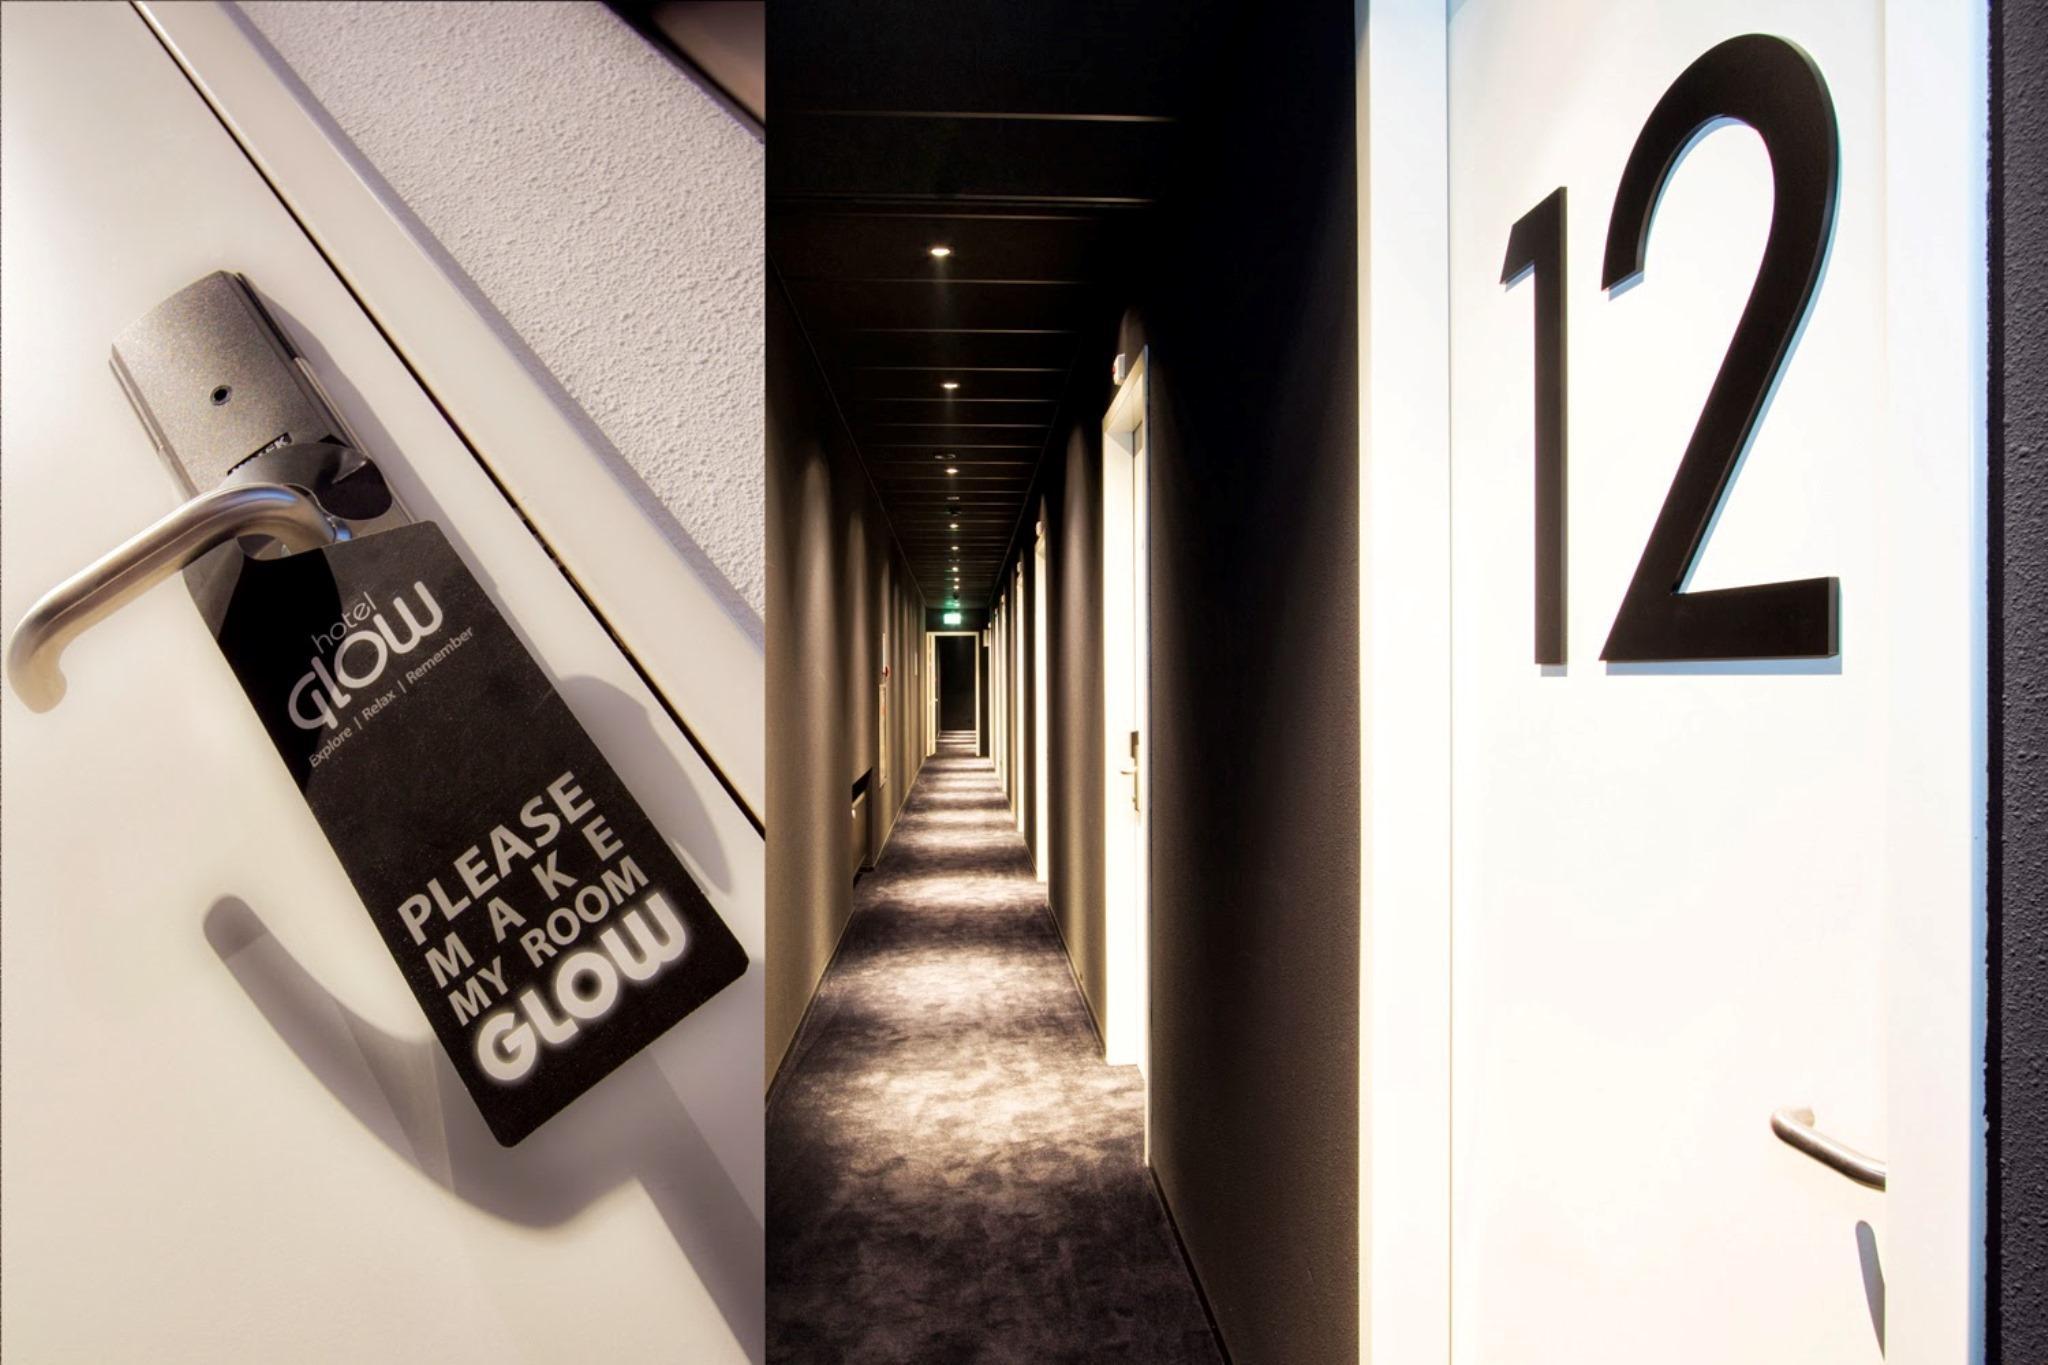 Boutique Hotel Glow, Eindhoven